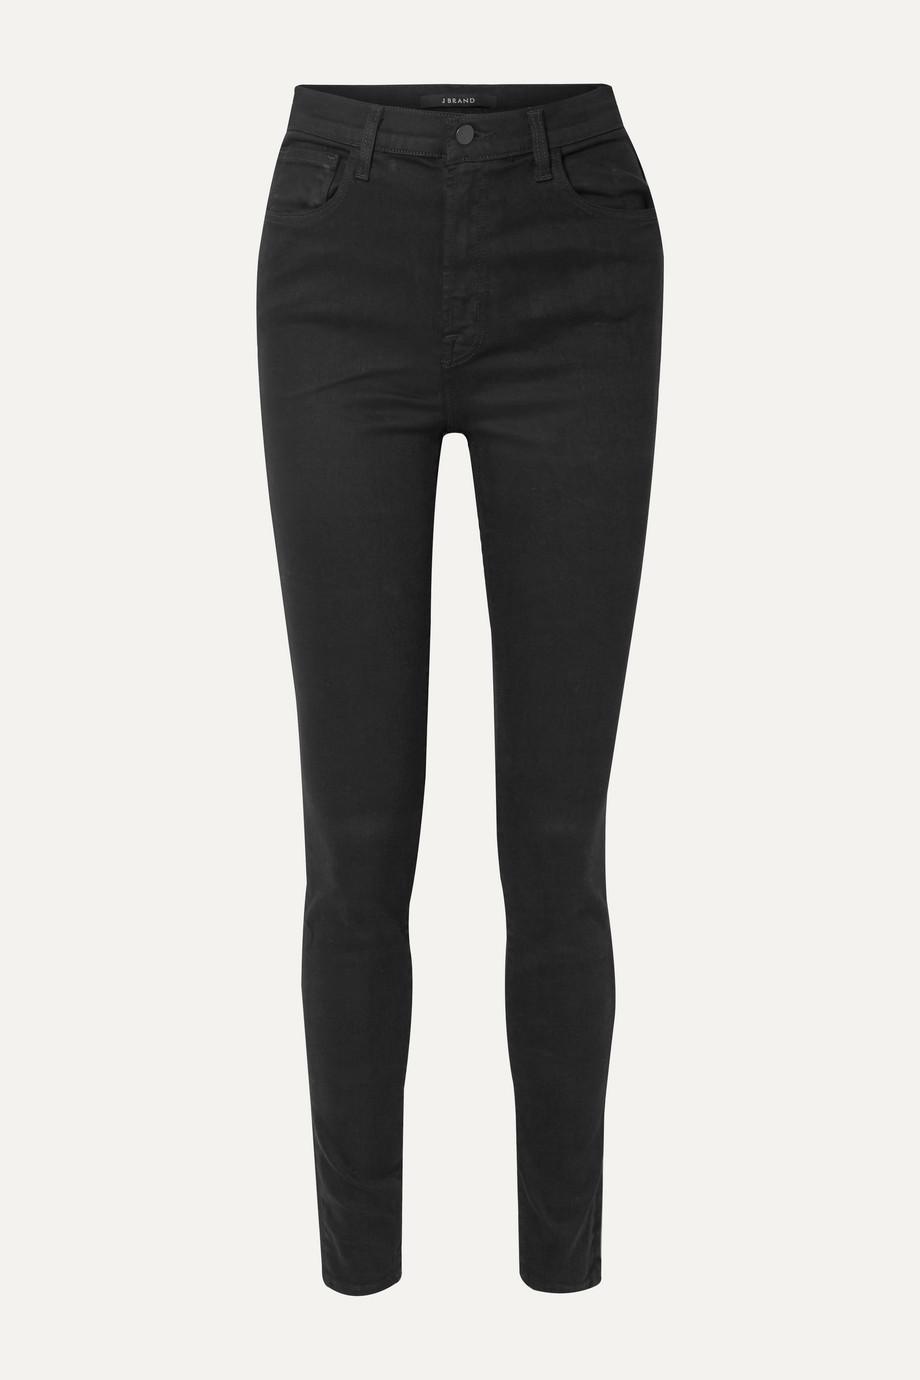 "J Brand Carolina 32"" hoch sitzende Skinny Jeans"